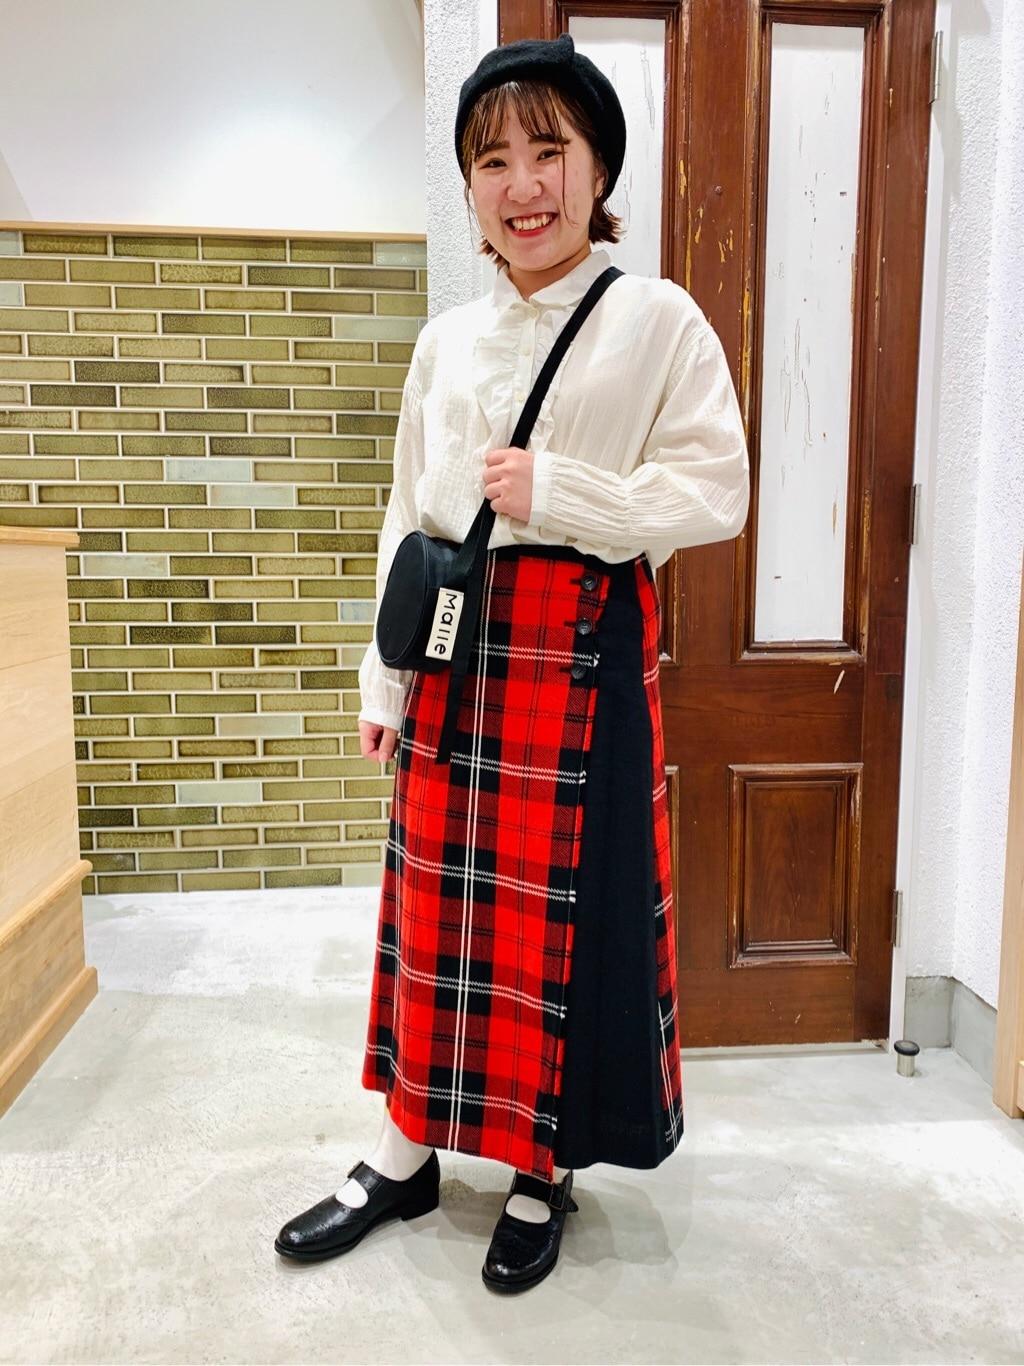 chambre de charme 横浜ジョイナス 身長:155cm 2020.10.21